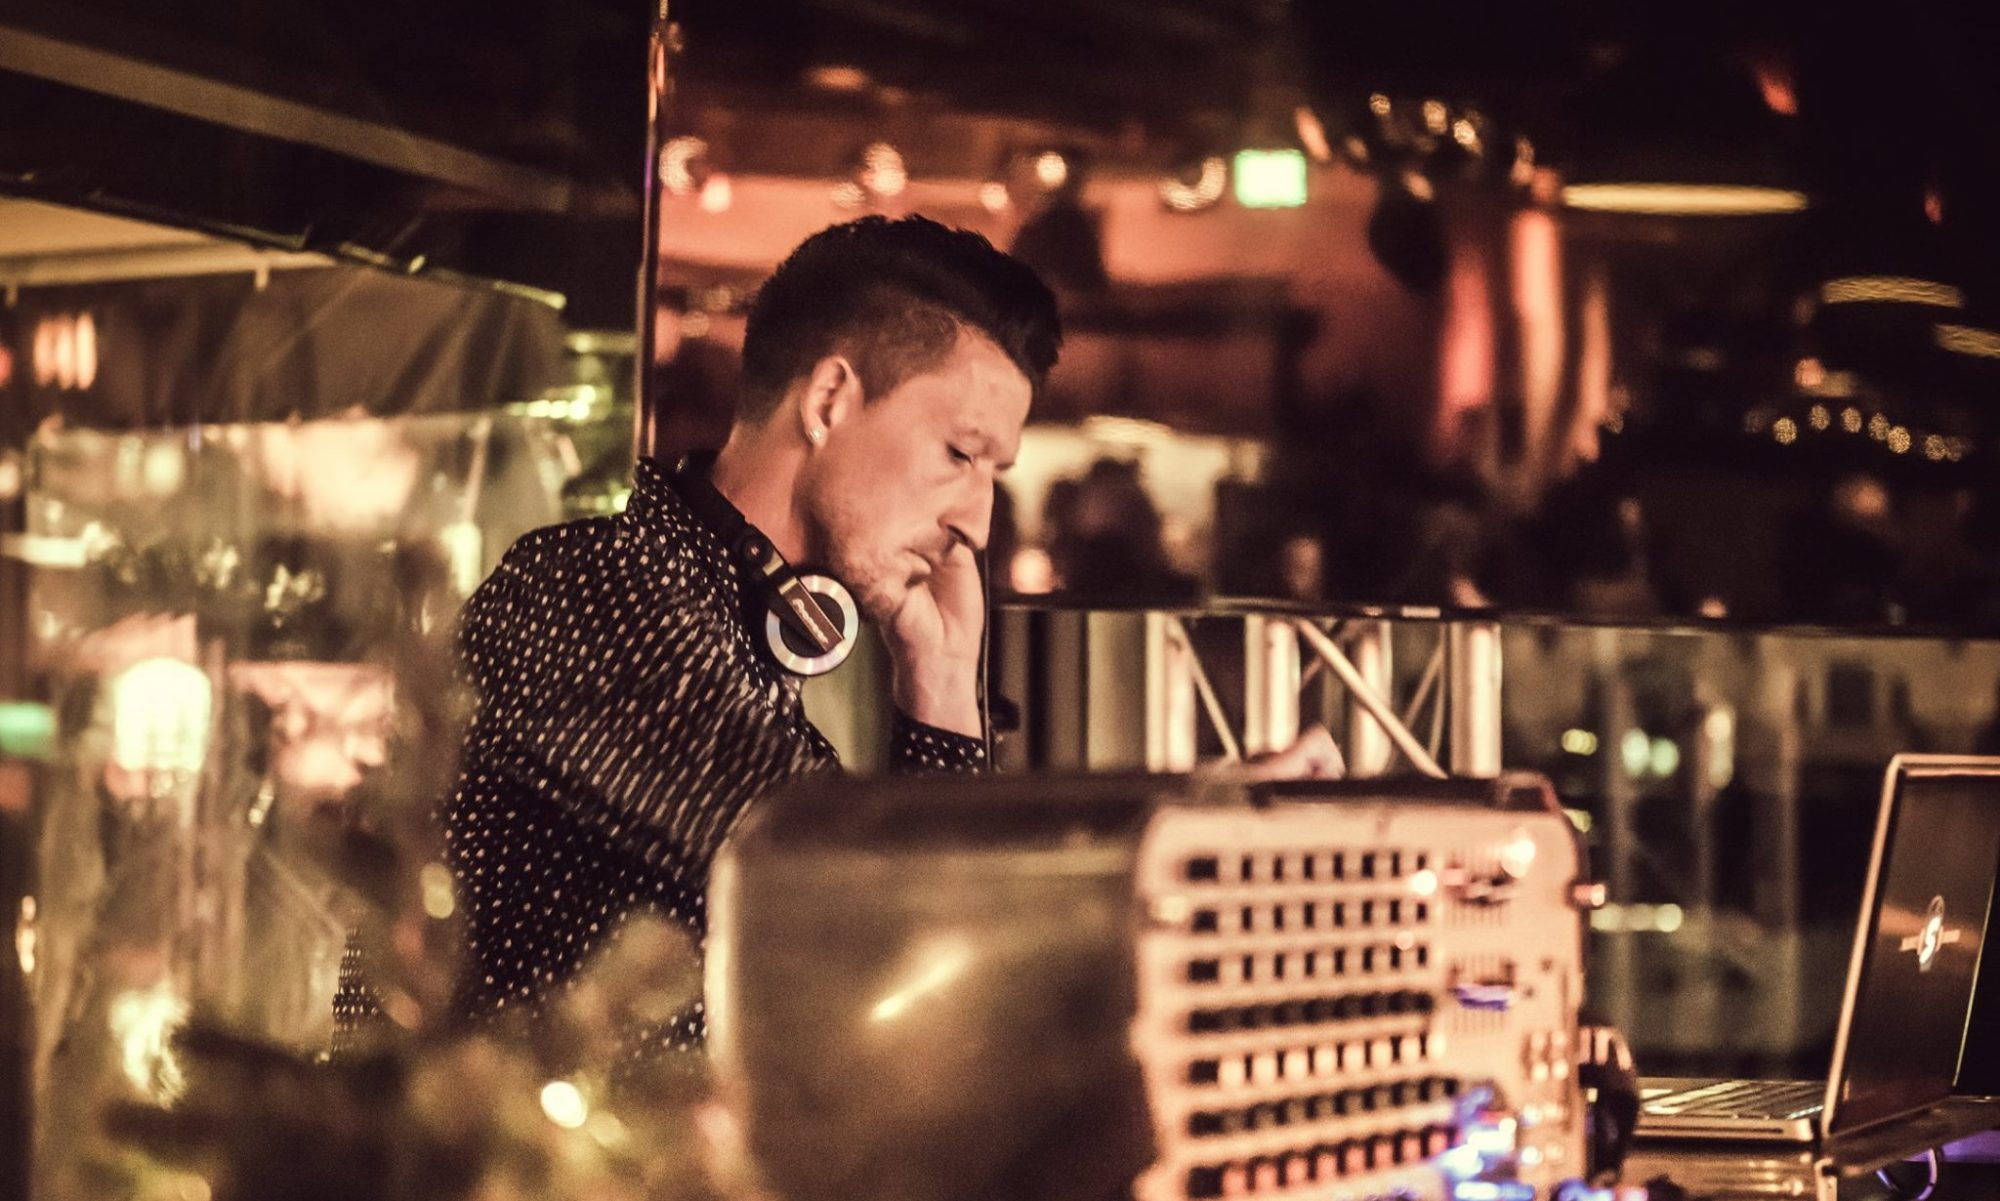 Silencebreaker - DJ & Events